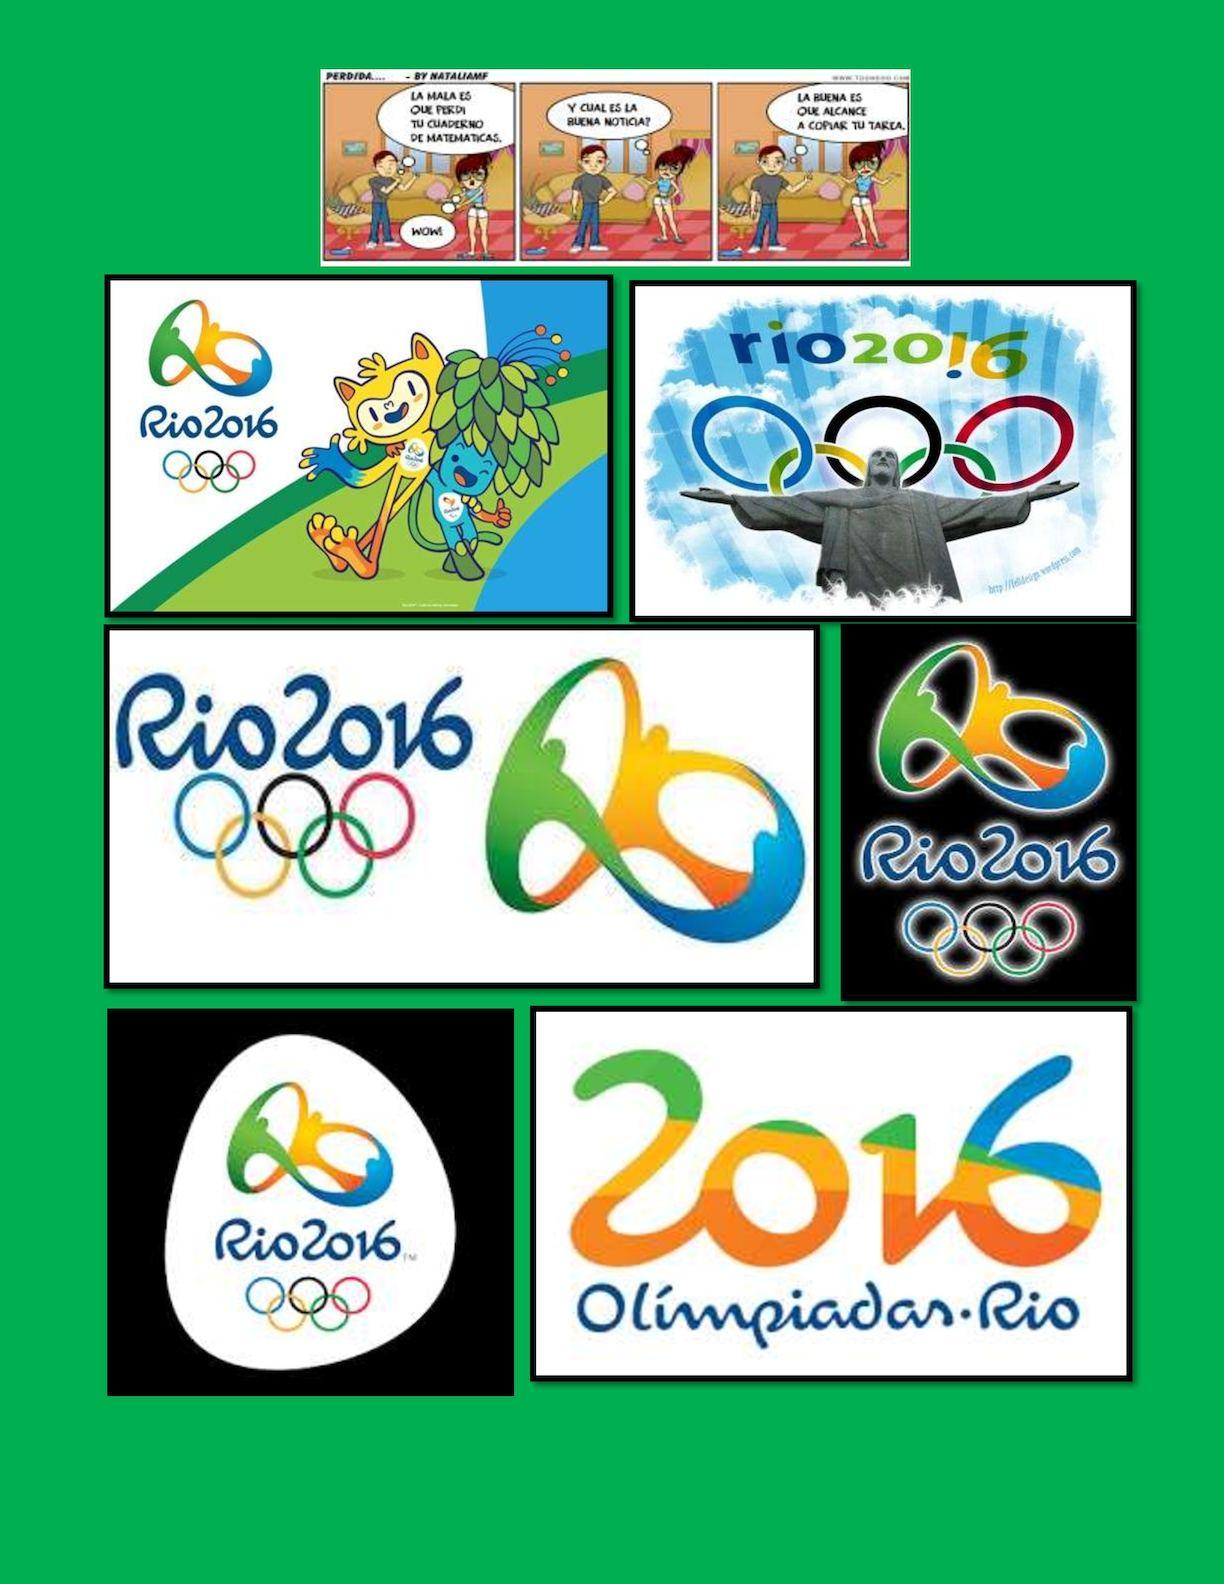 Calaméo - Juegos Olimpicos rio 2016